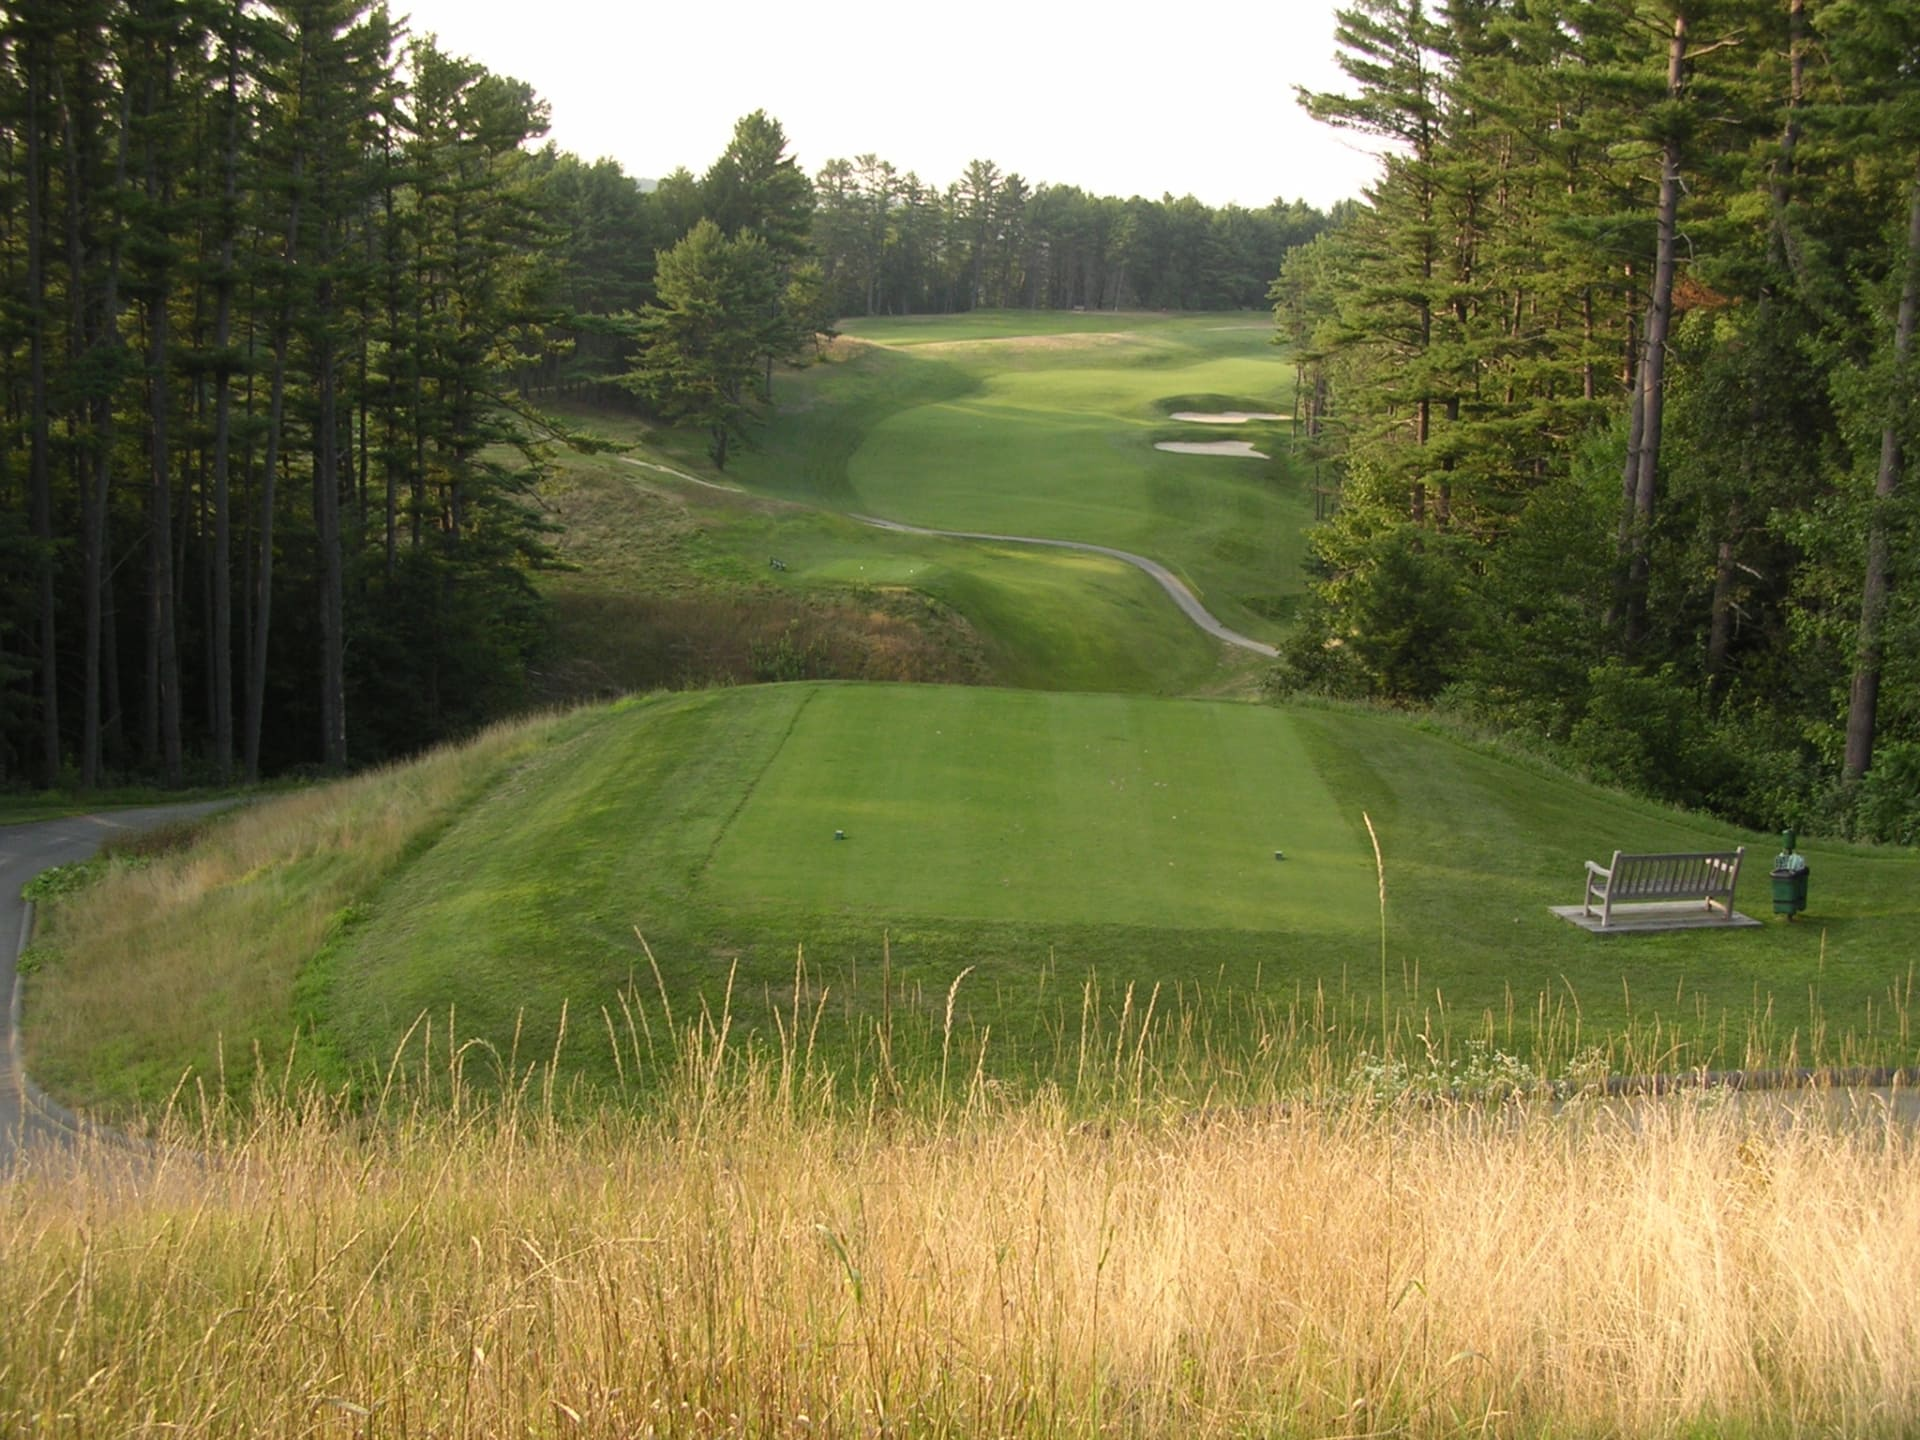 Spring-Golf-Course.JPG-w1920.jpg